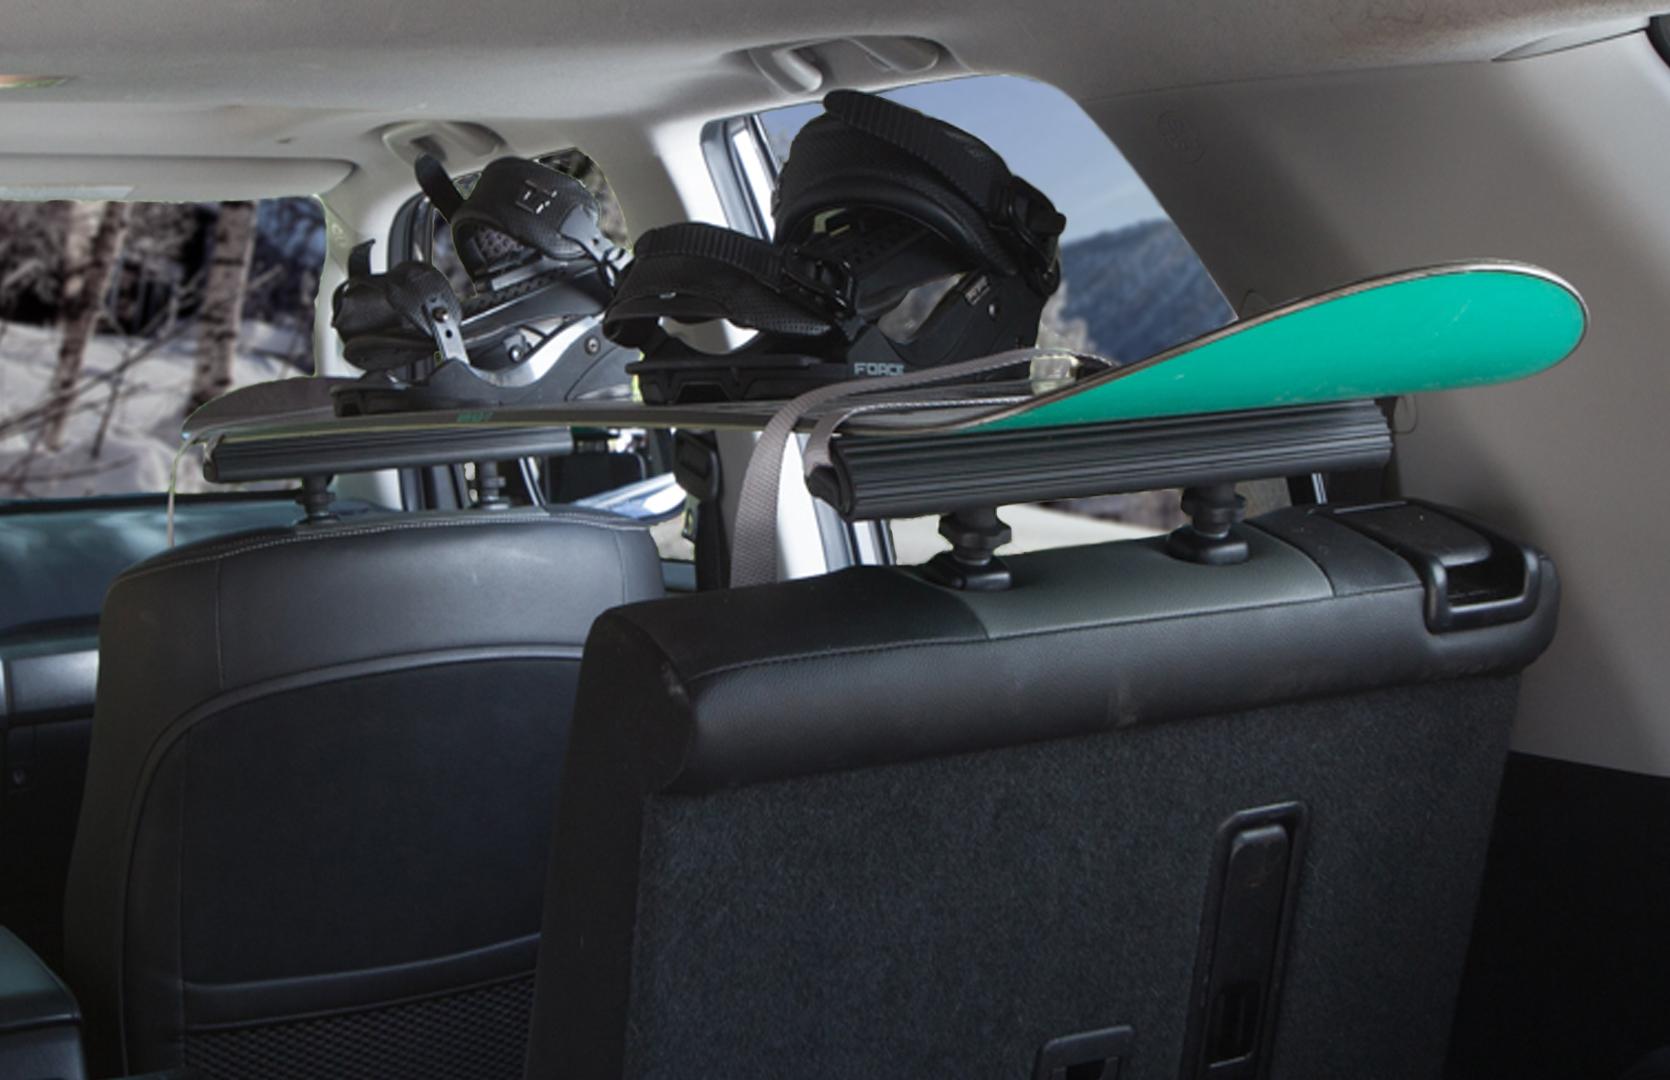 SeatRack_Snowboard